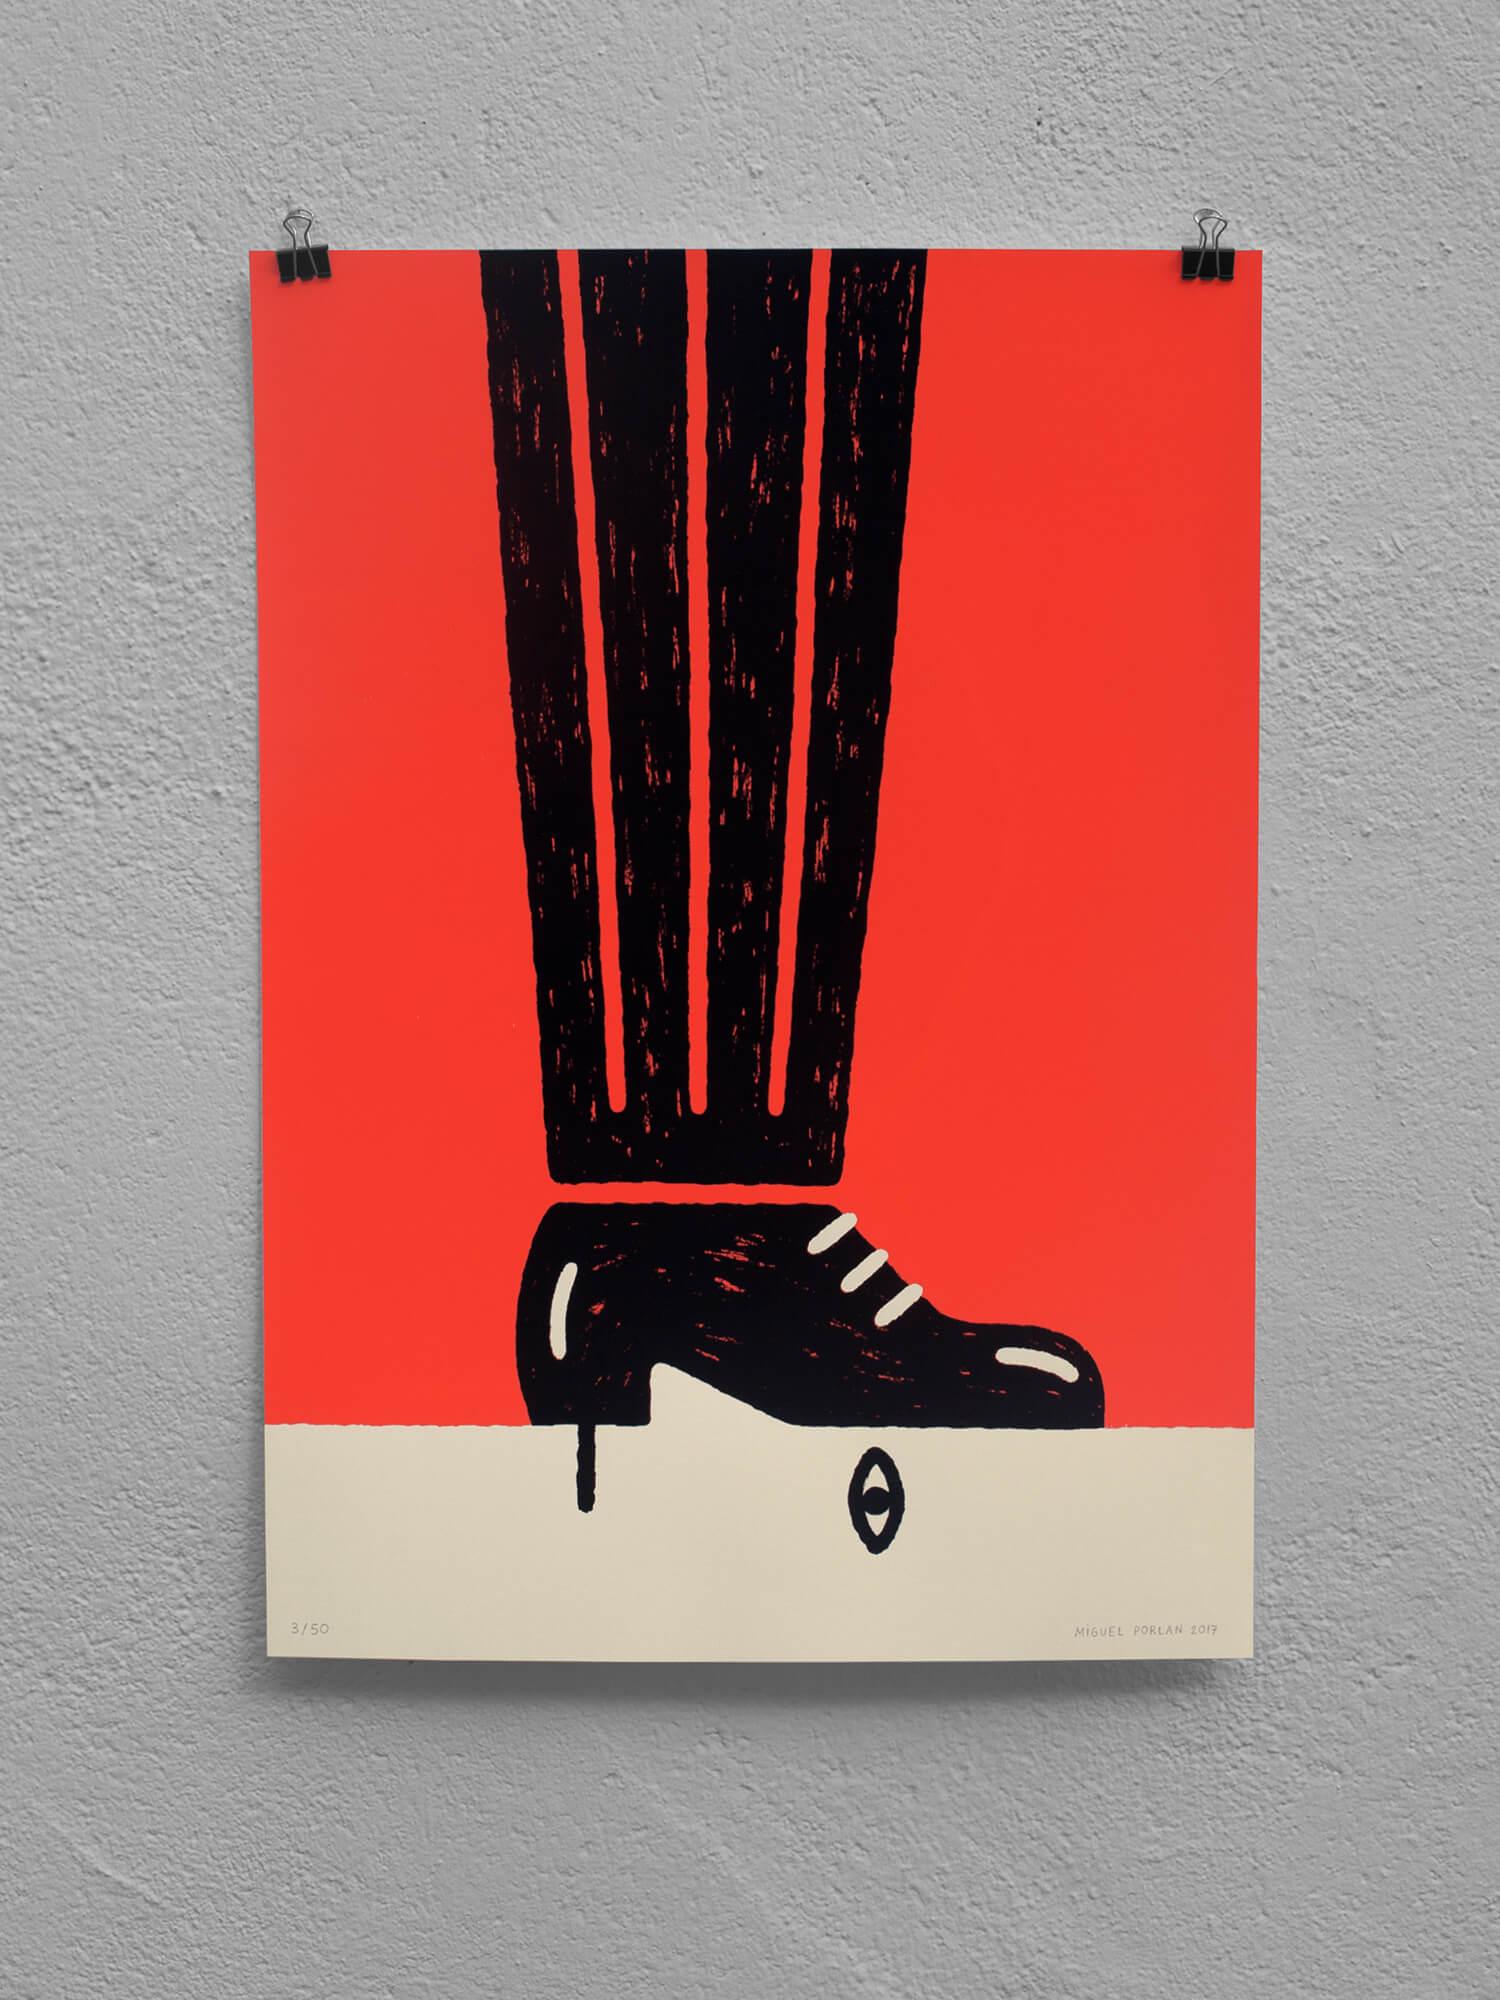 miguel porlan, illustration, poster, tailor-made, poster design